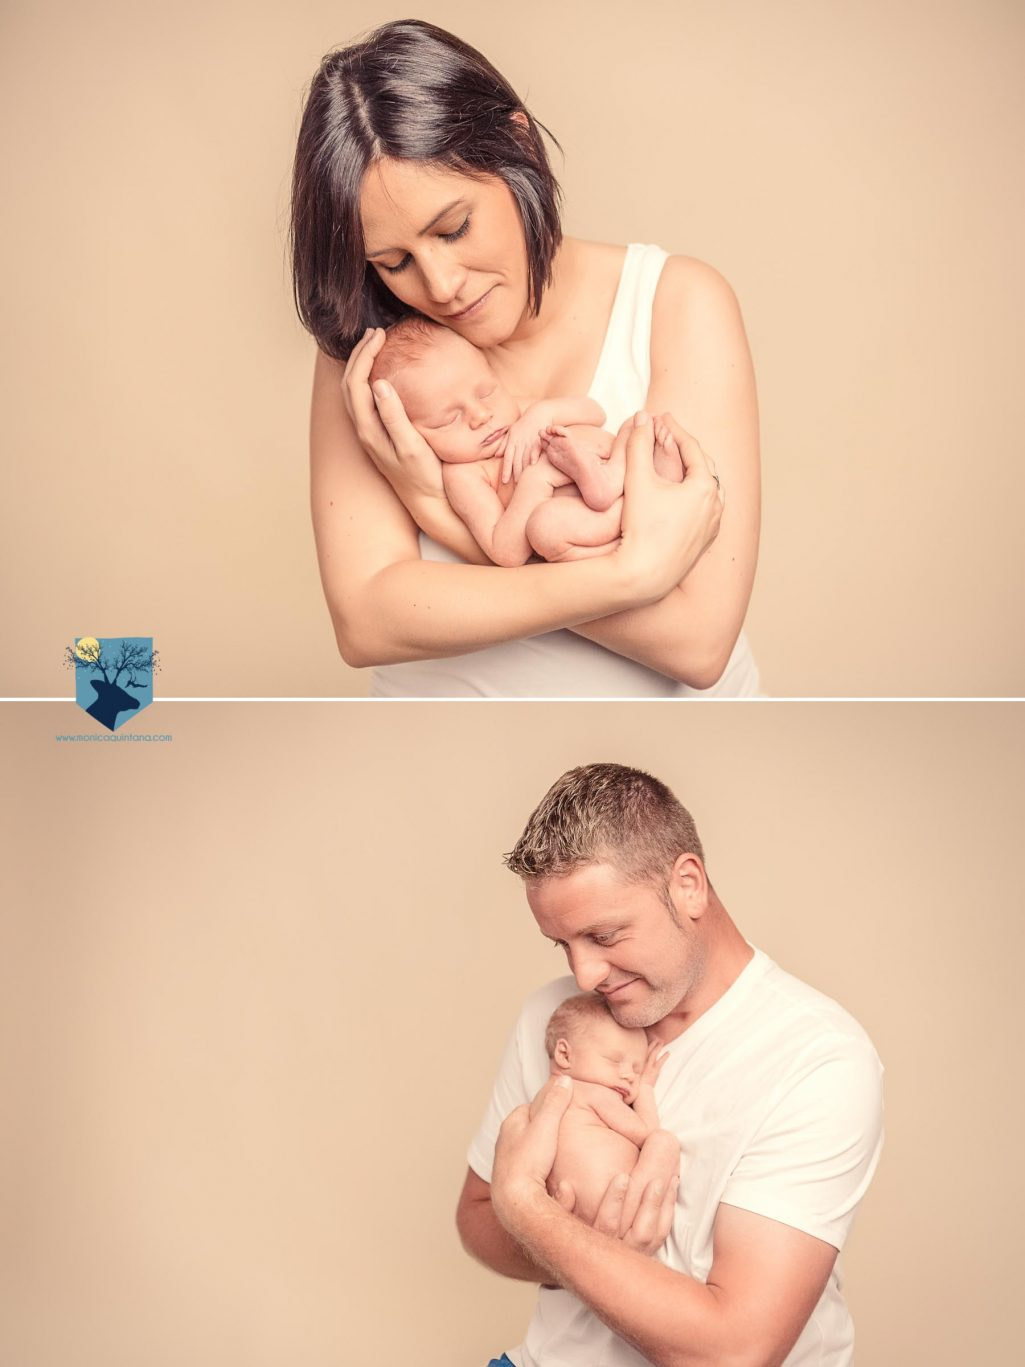 fotografia, girona, figueres, emporda, monica quintana, bebes, niños, familia, retrato, recien nacido, nado, newborn